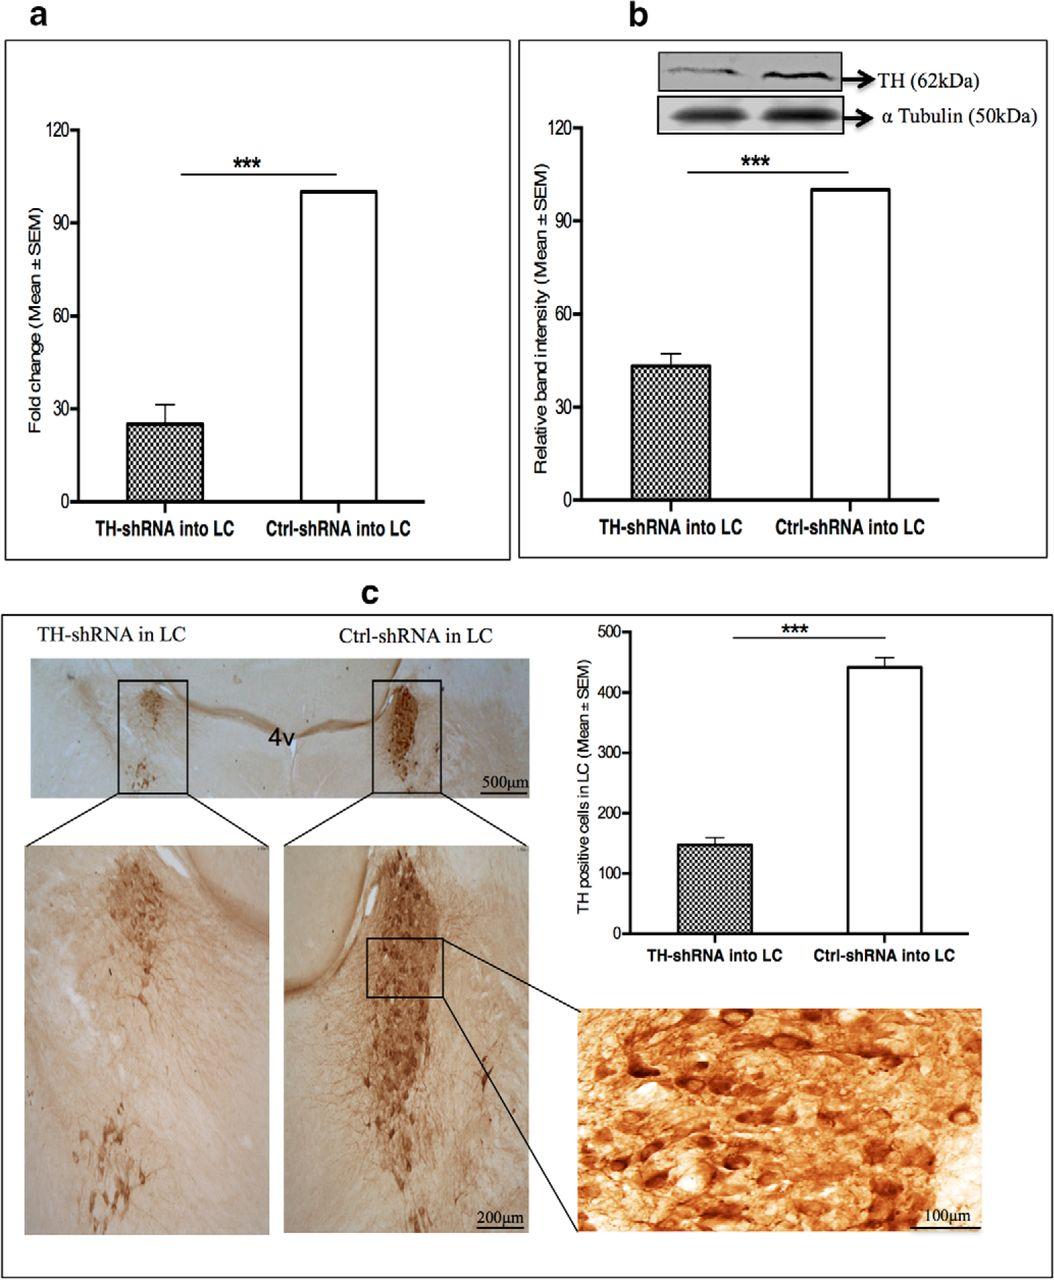 Noradrenaline from Locus Coeruleus Neurons Acts on Pedunculo